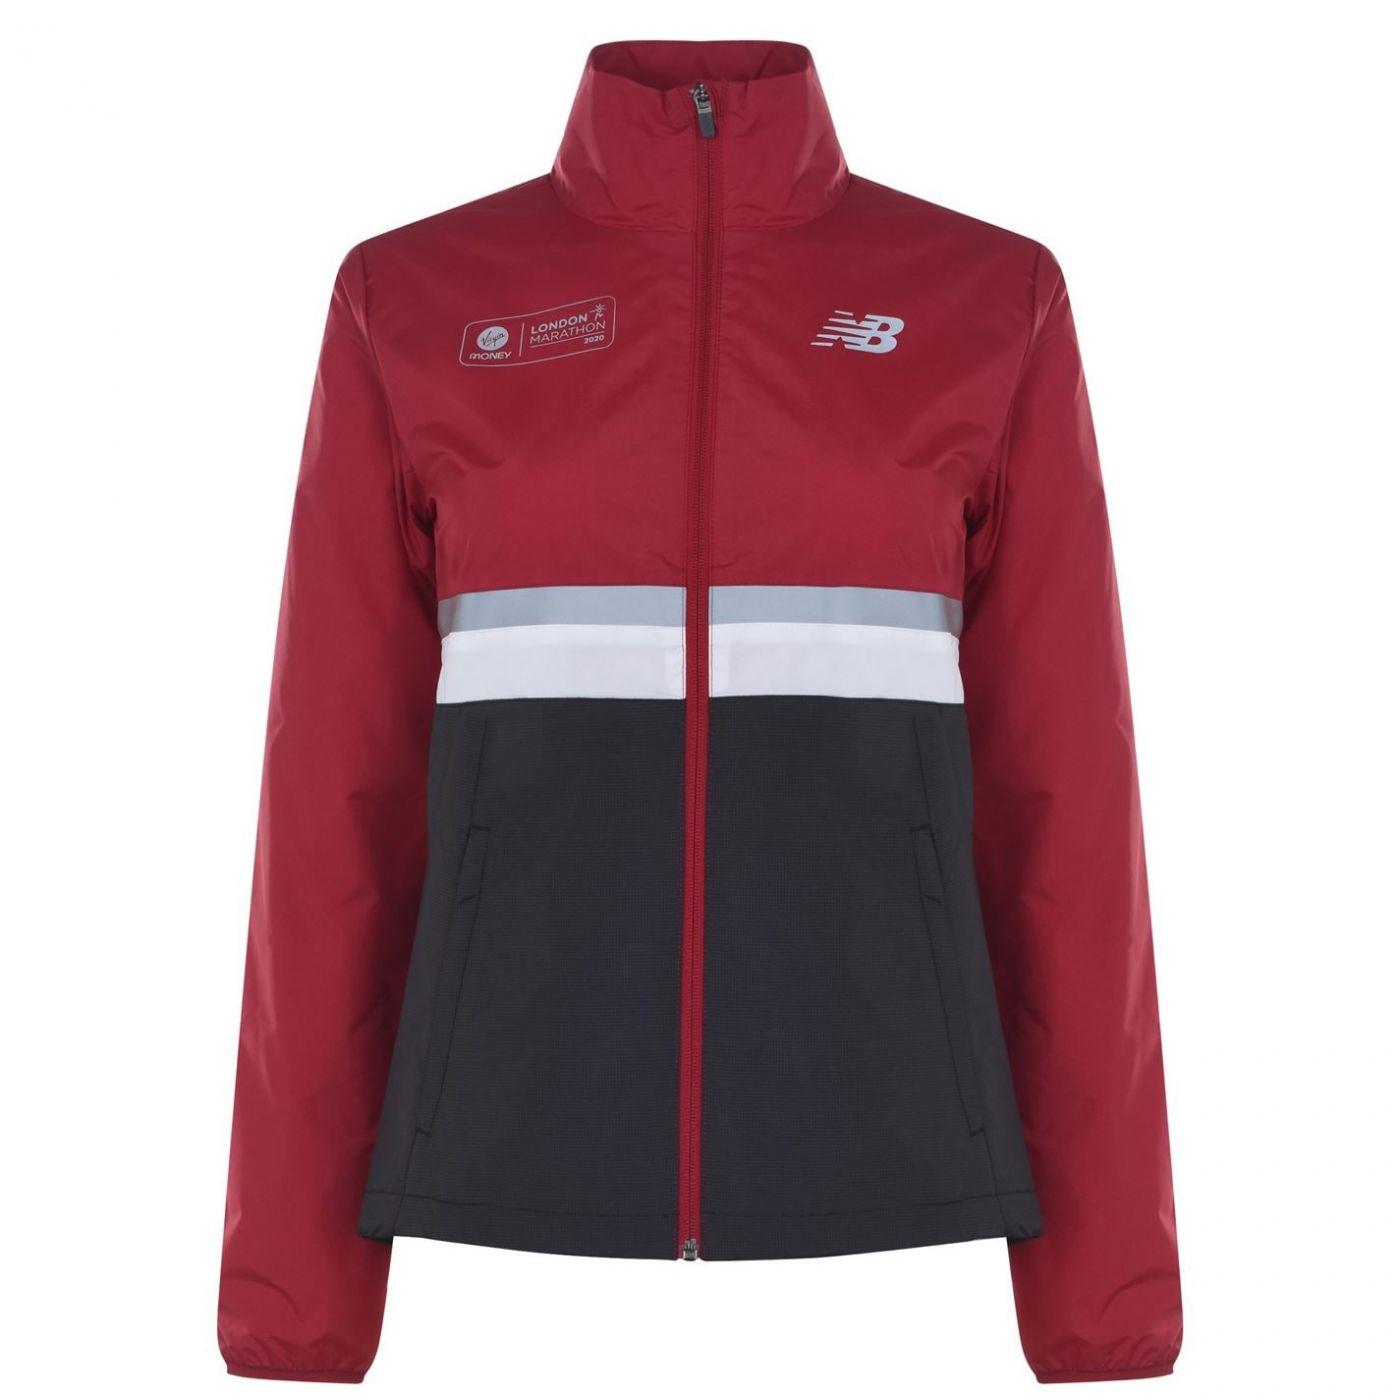 New Balance London Edition Jacket Ladies